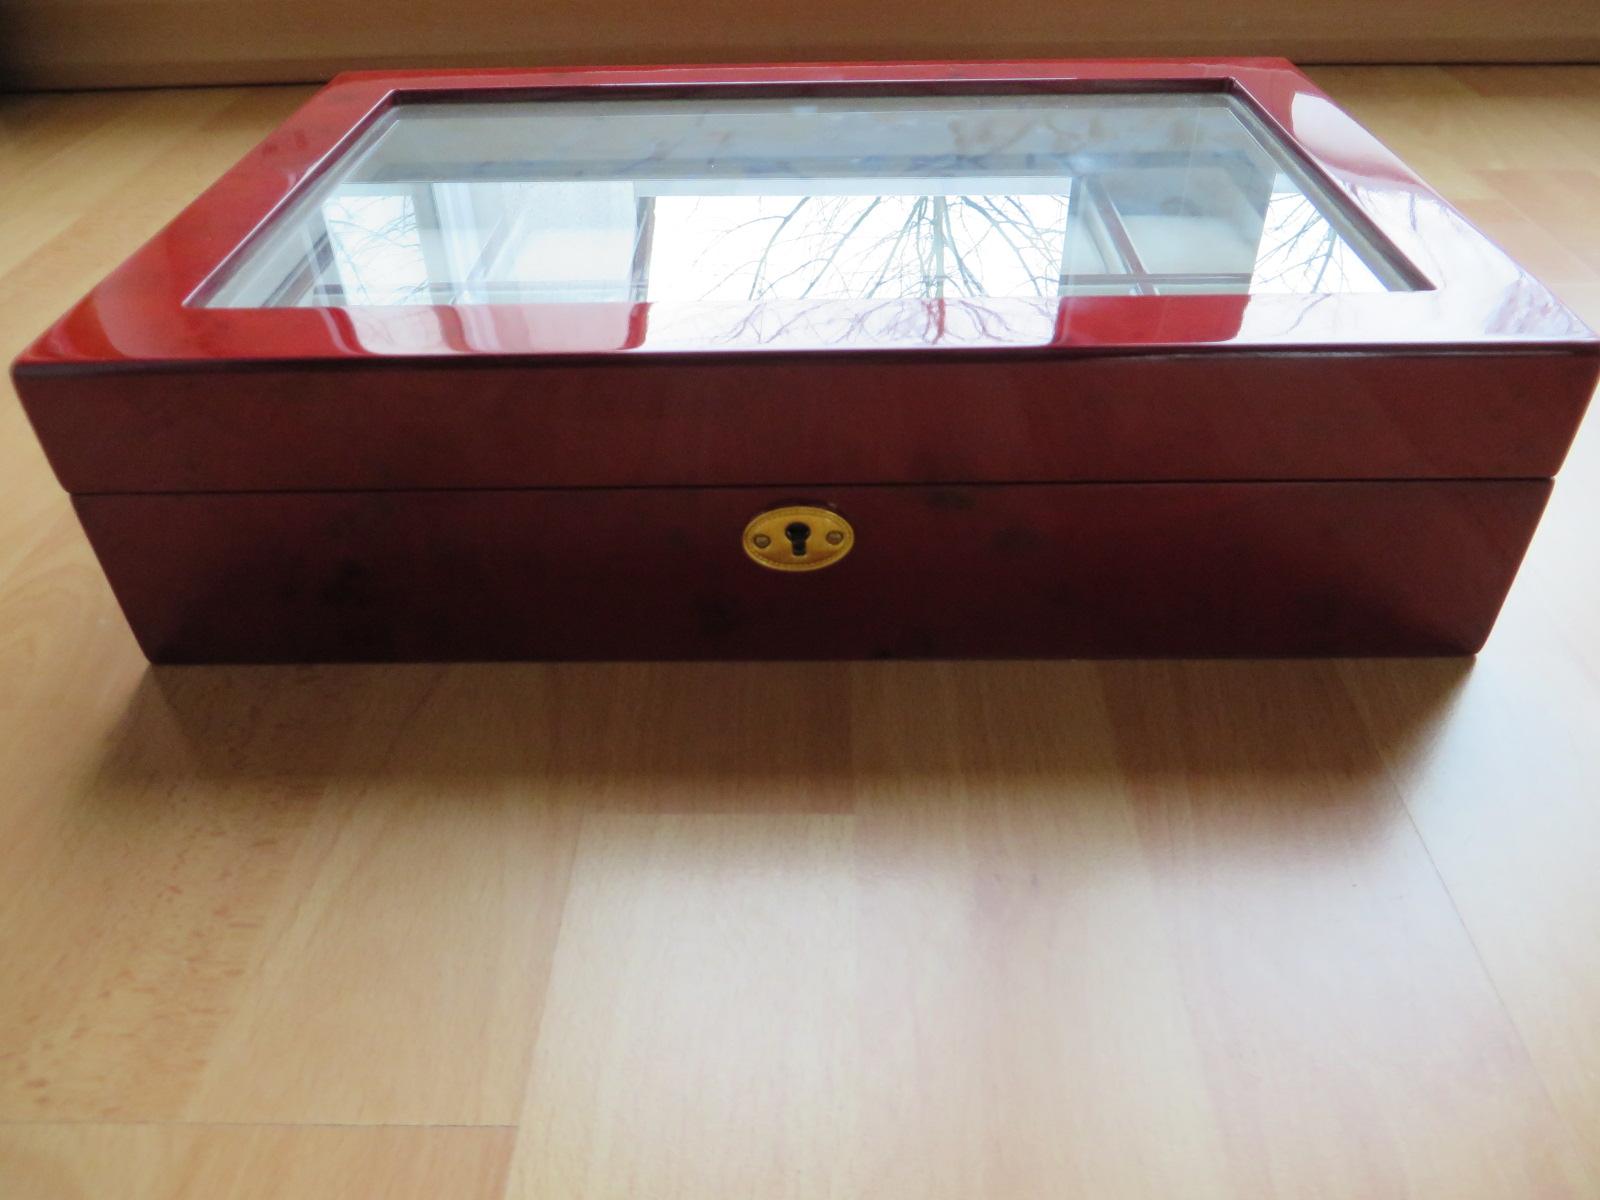 erledigt hochwertige uhrenbox f r 12 uhren aus holz in klavierlackoptik uhrforum. Black Bedroom Furniture Sets. Home Design Ideas